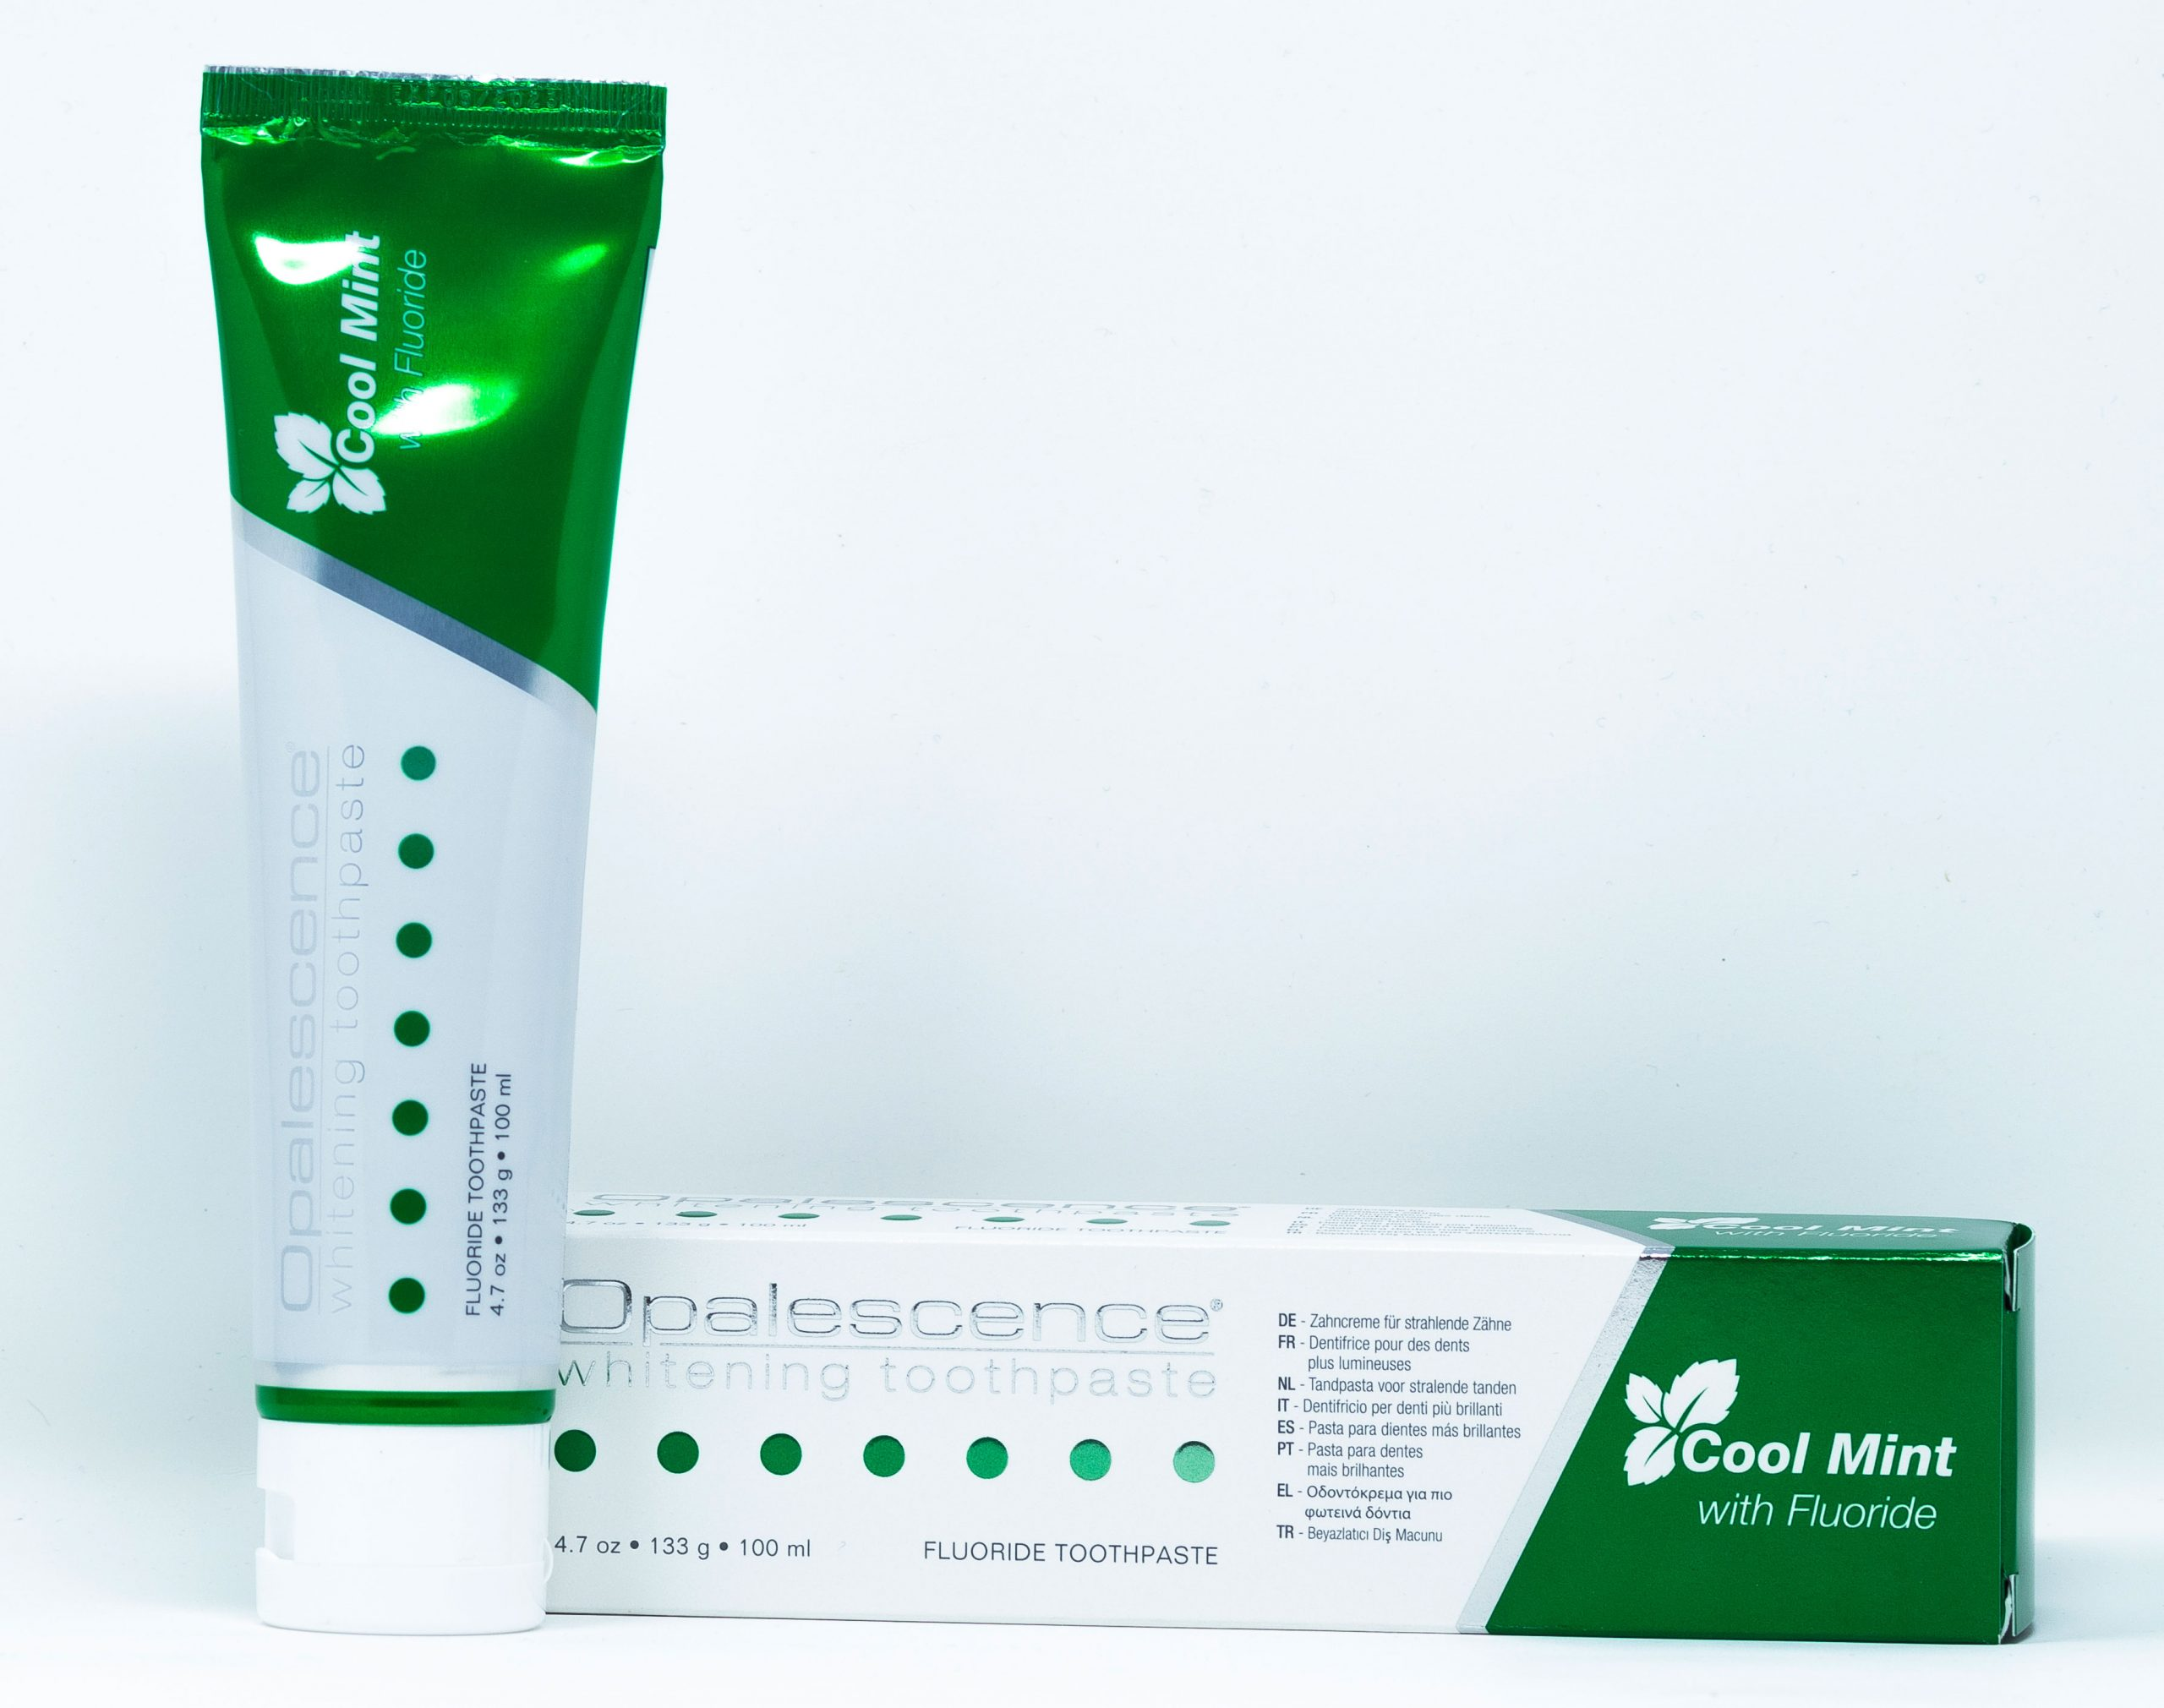 Ultradent Dentifricio Opalescence Whitening - 100 ml